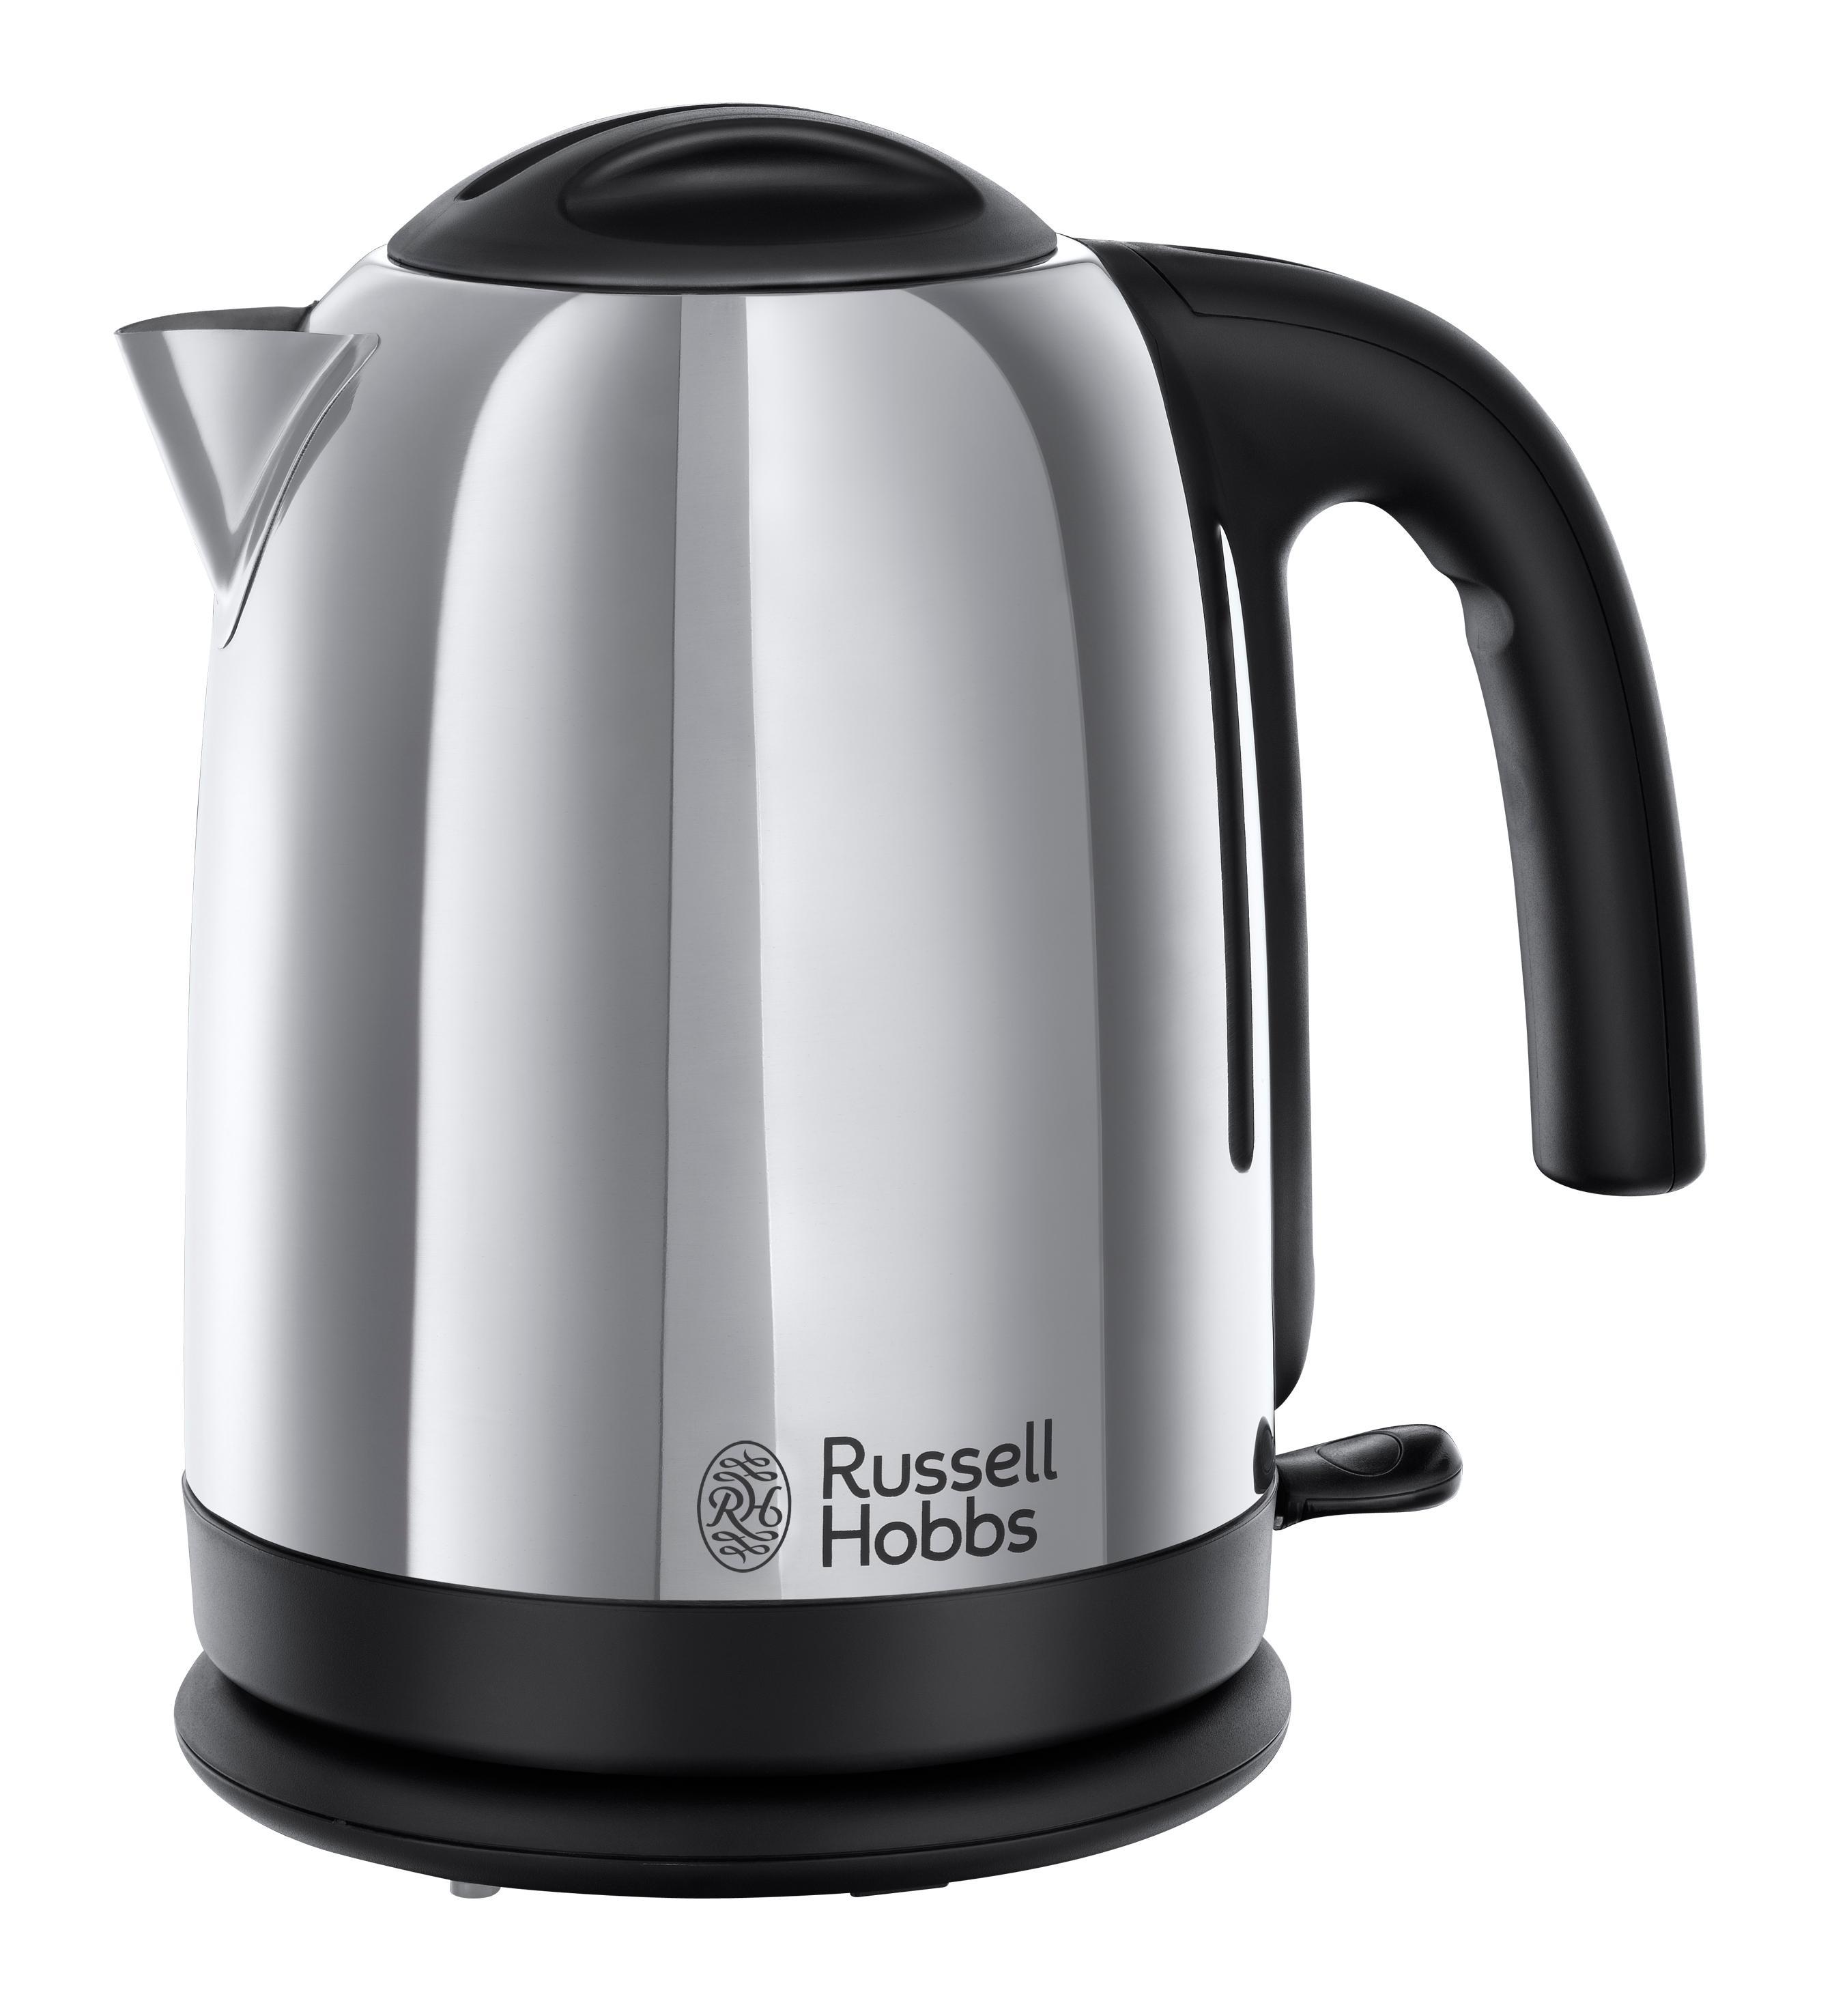 russell hobbs electric pressure cooker manual